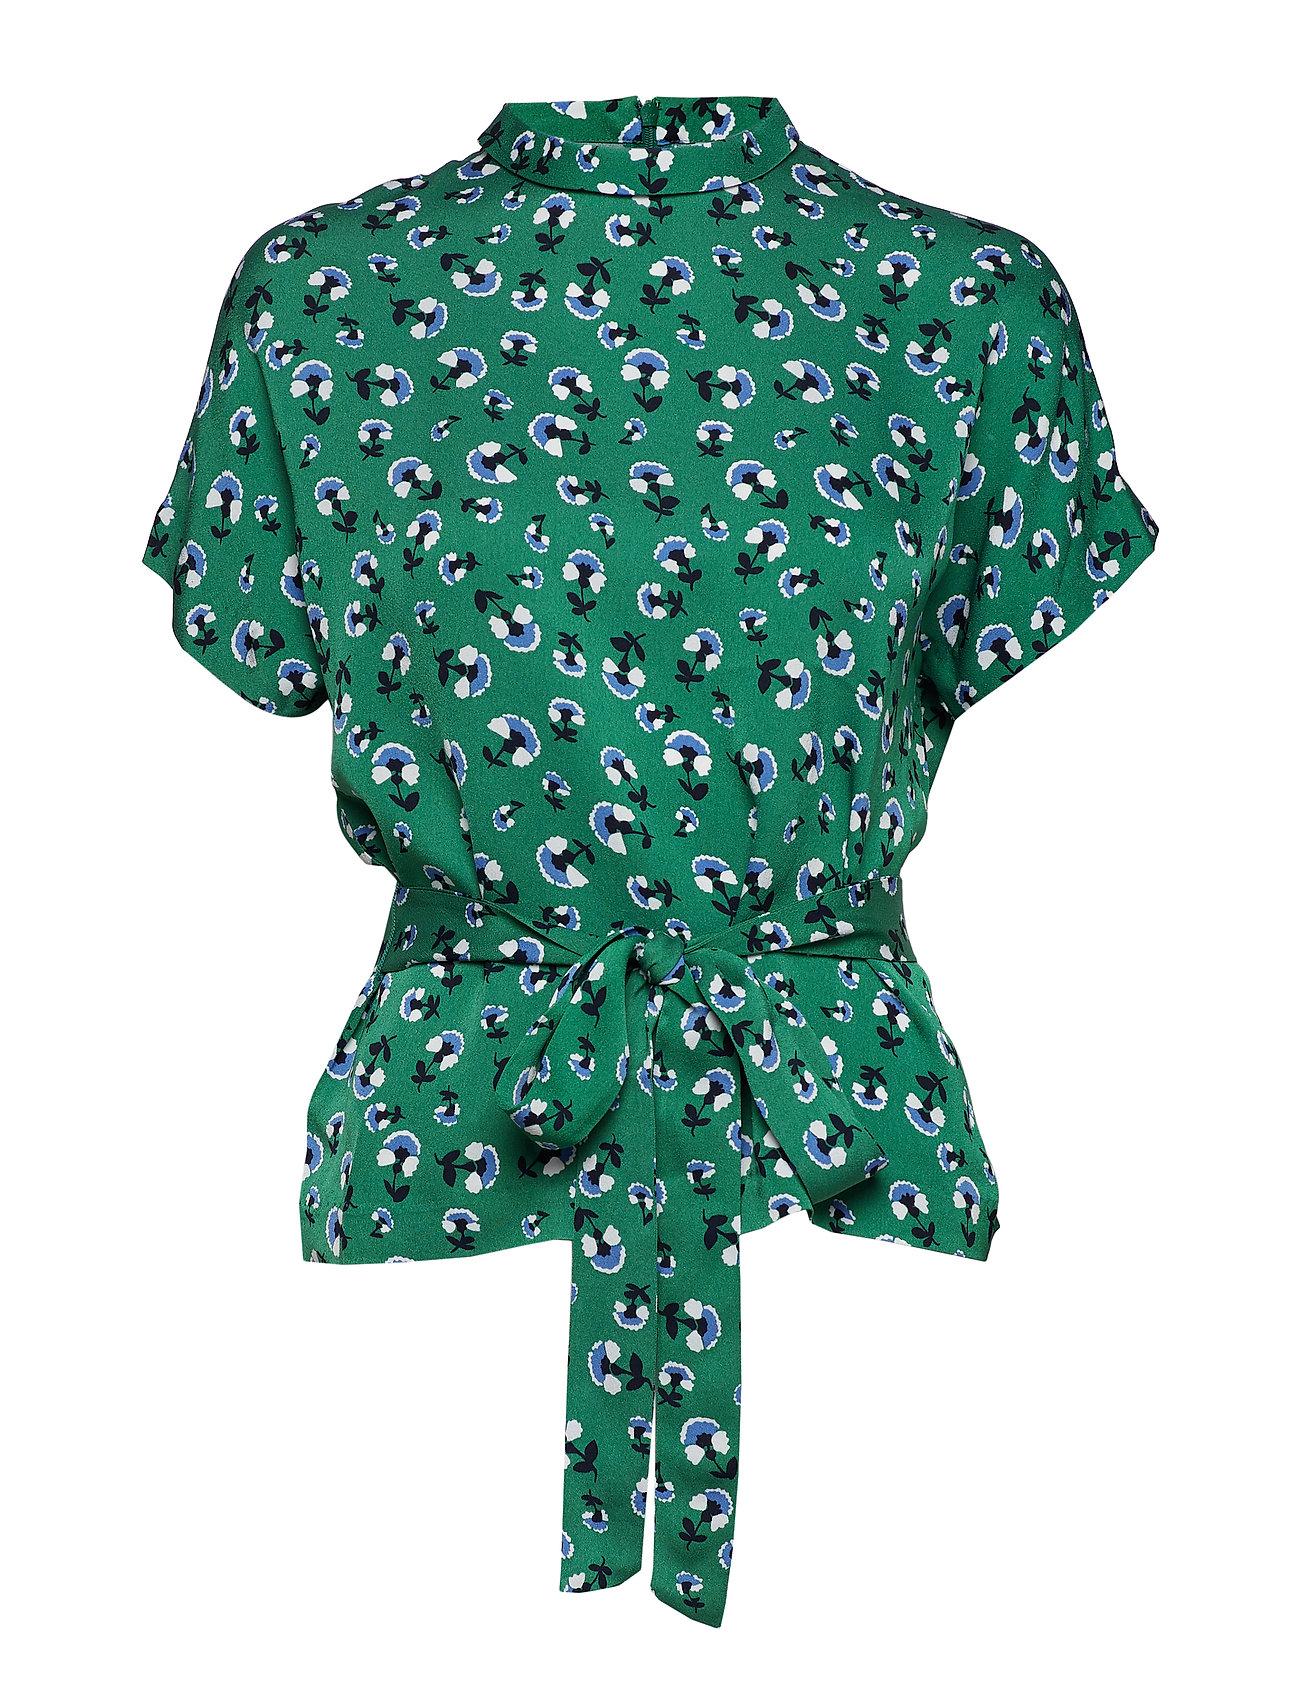 Samsøe & Samsøe Blumea blouse ss aop 8325 - GREEN CARNATION